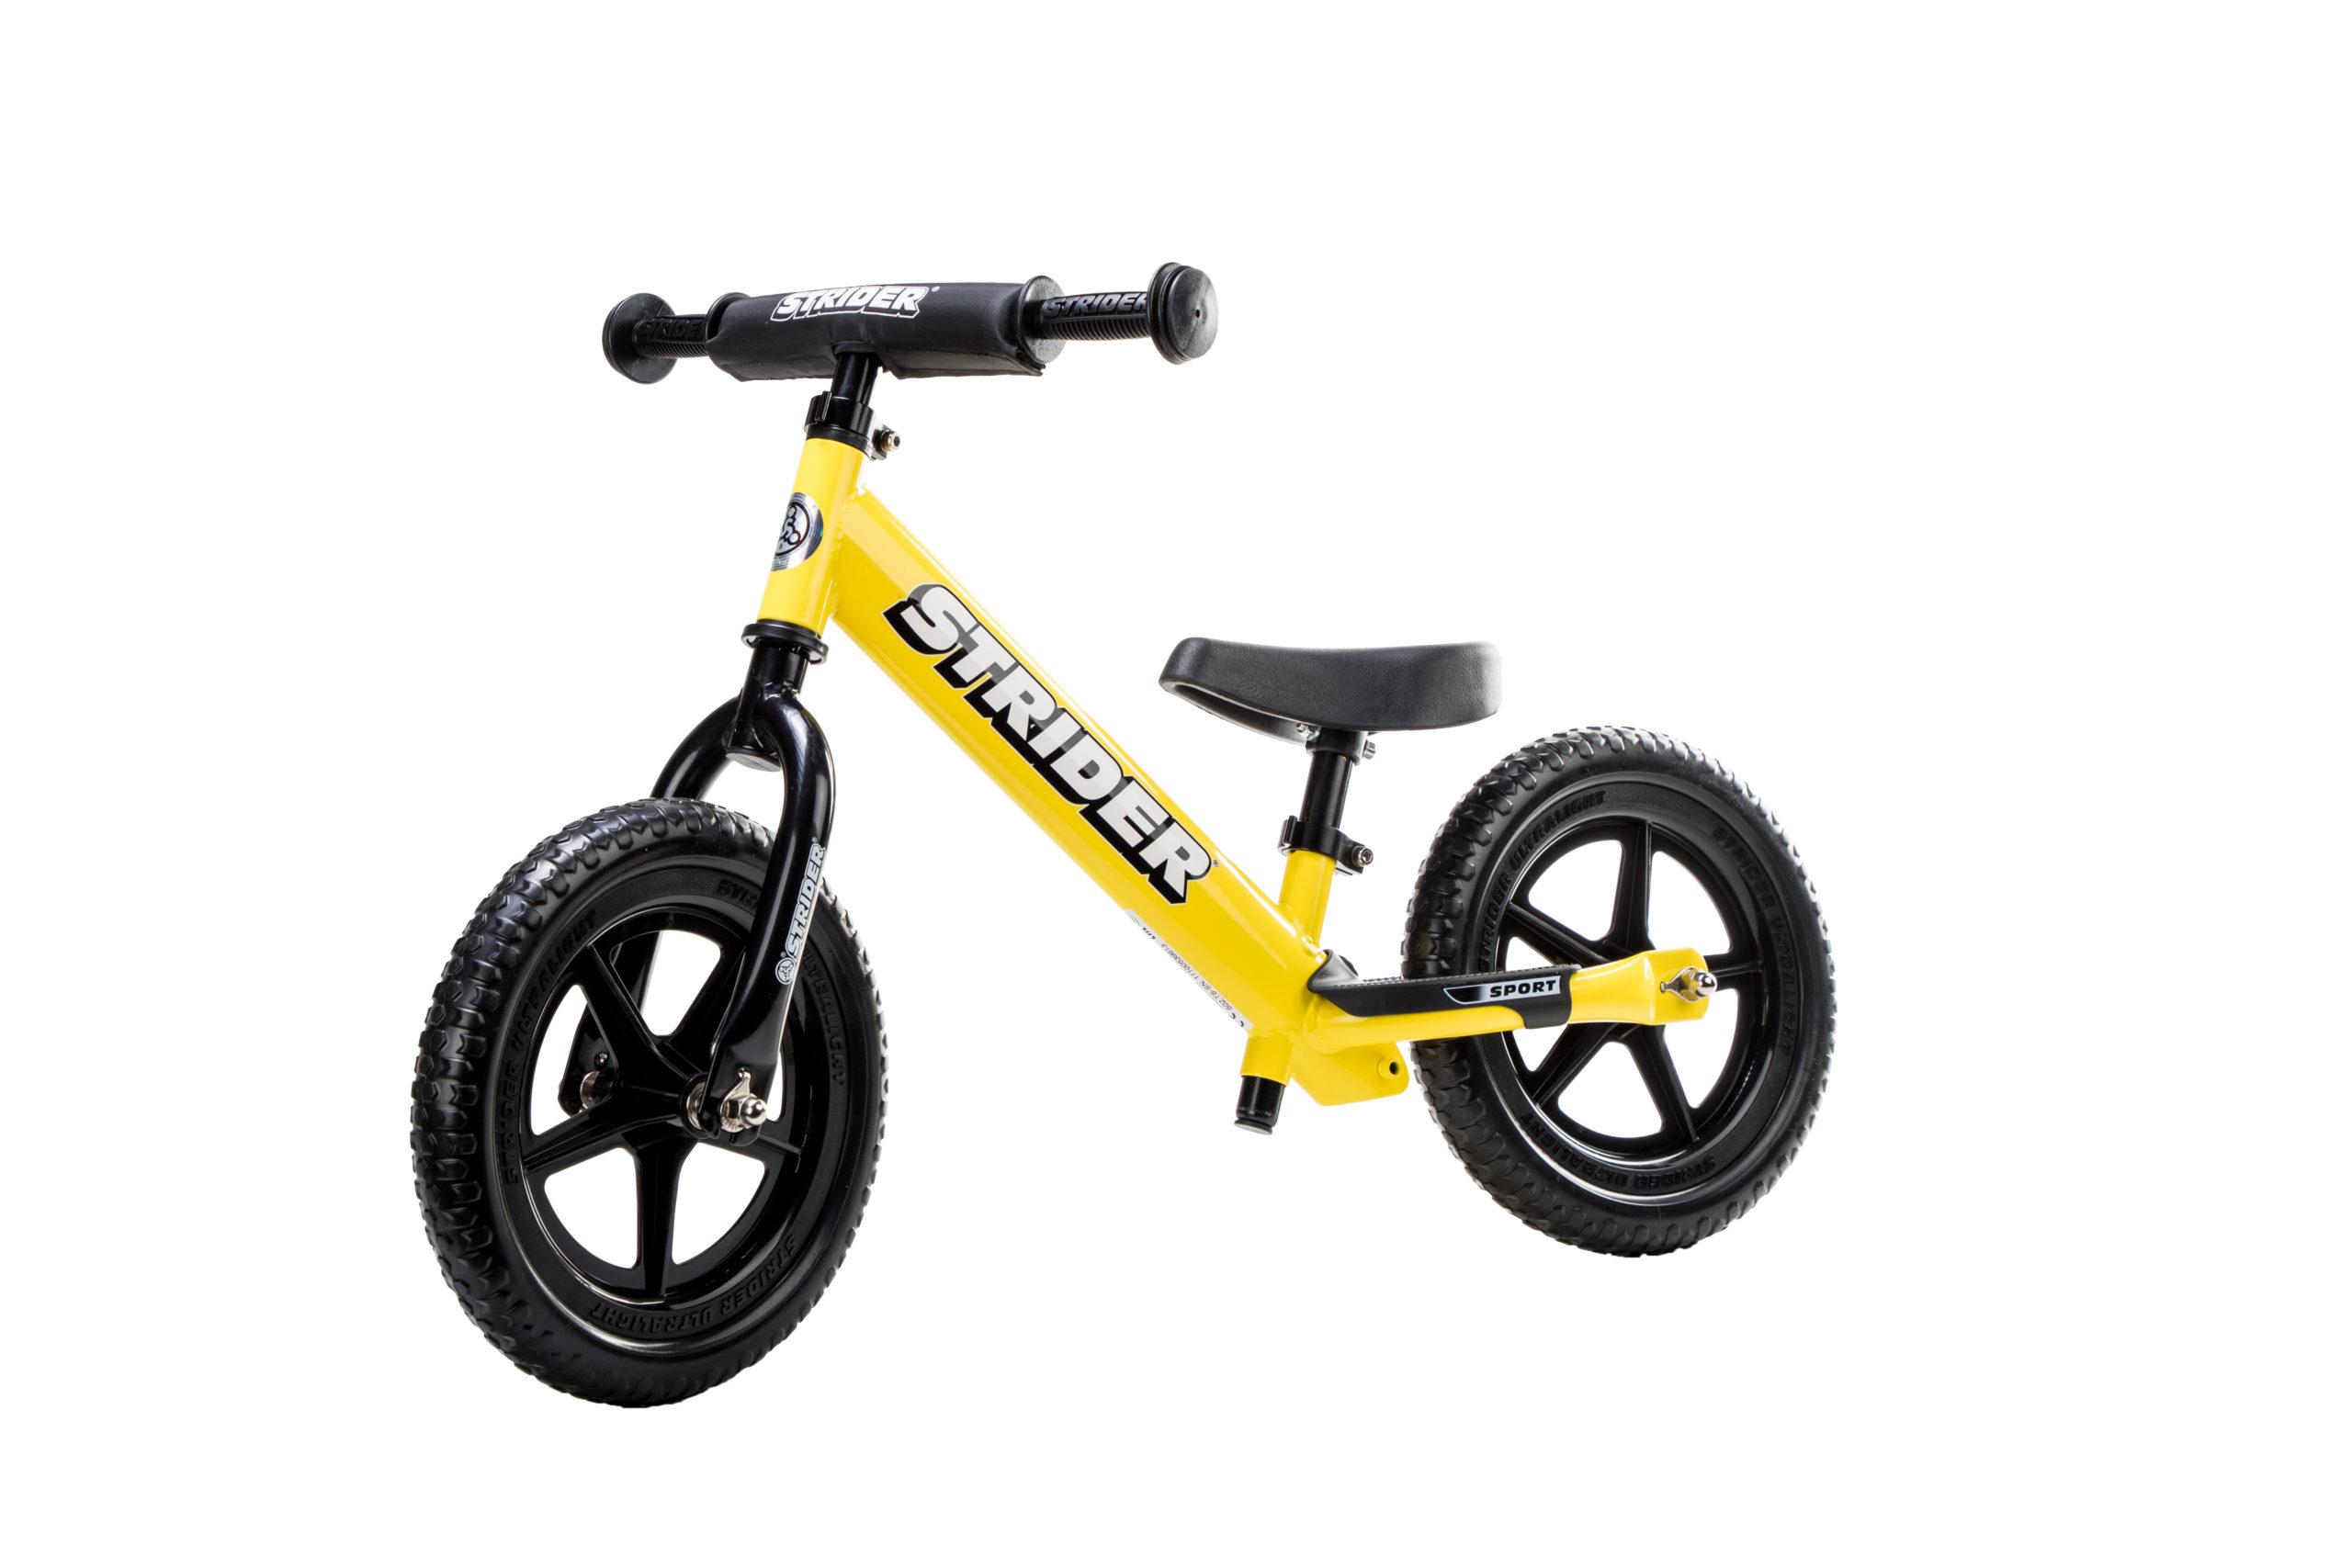 Studio image of Yellow 12 Sport bike at angle